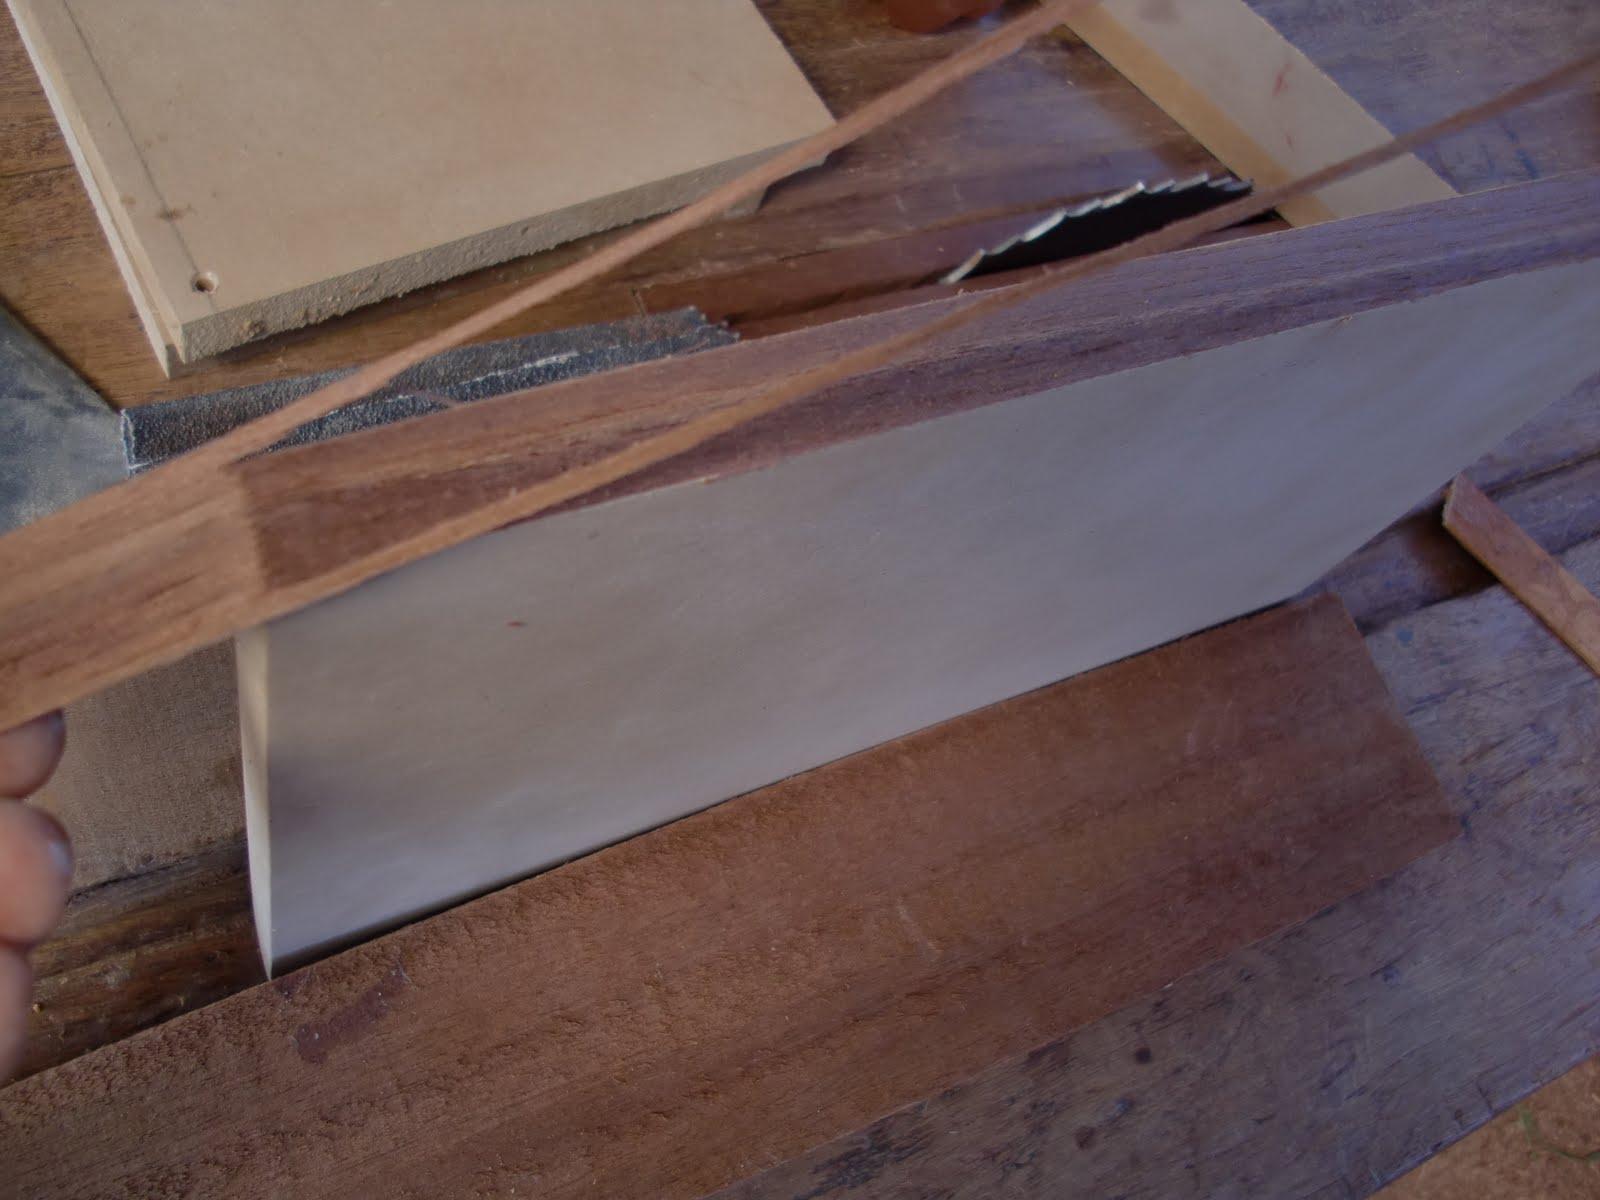 Decoraciones manualidades en madera pegar lamina de - Forrar paredes de madera ...